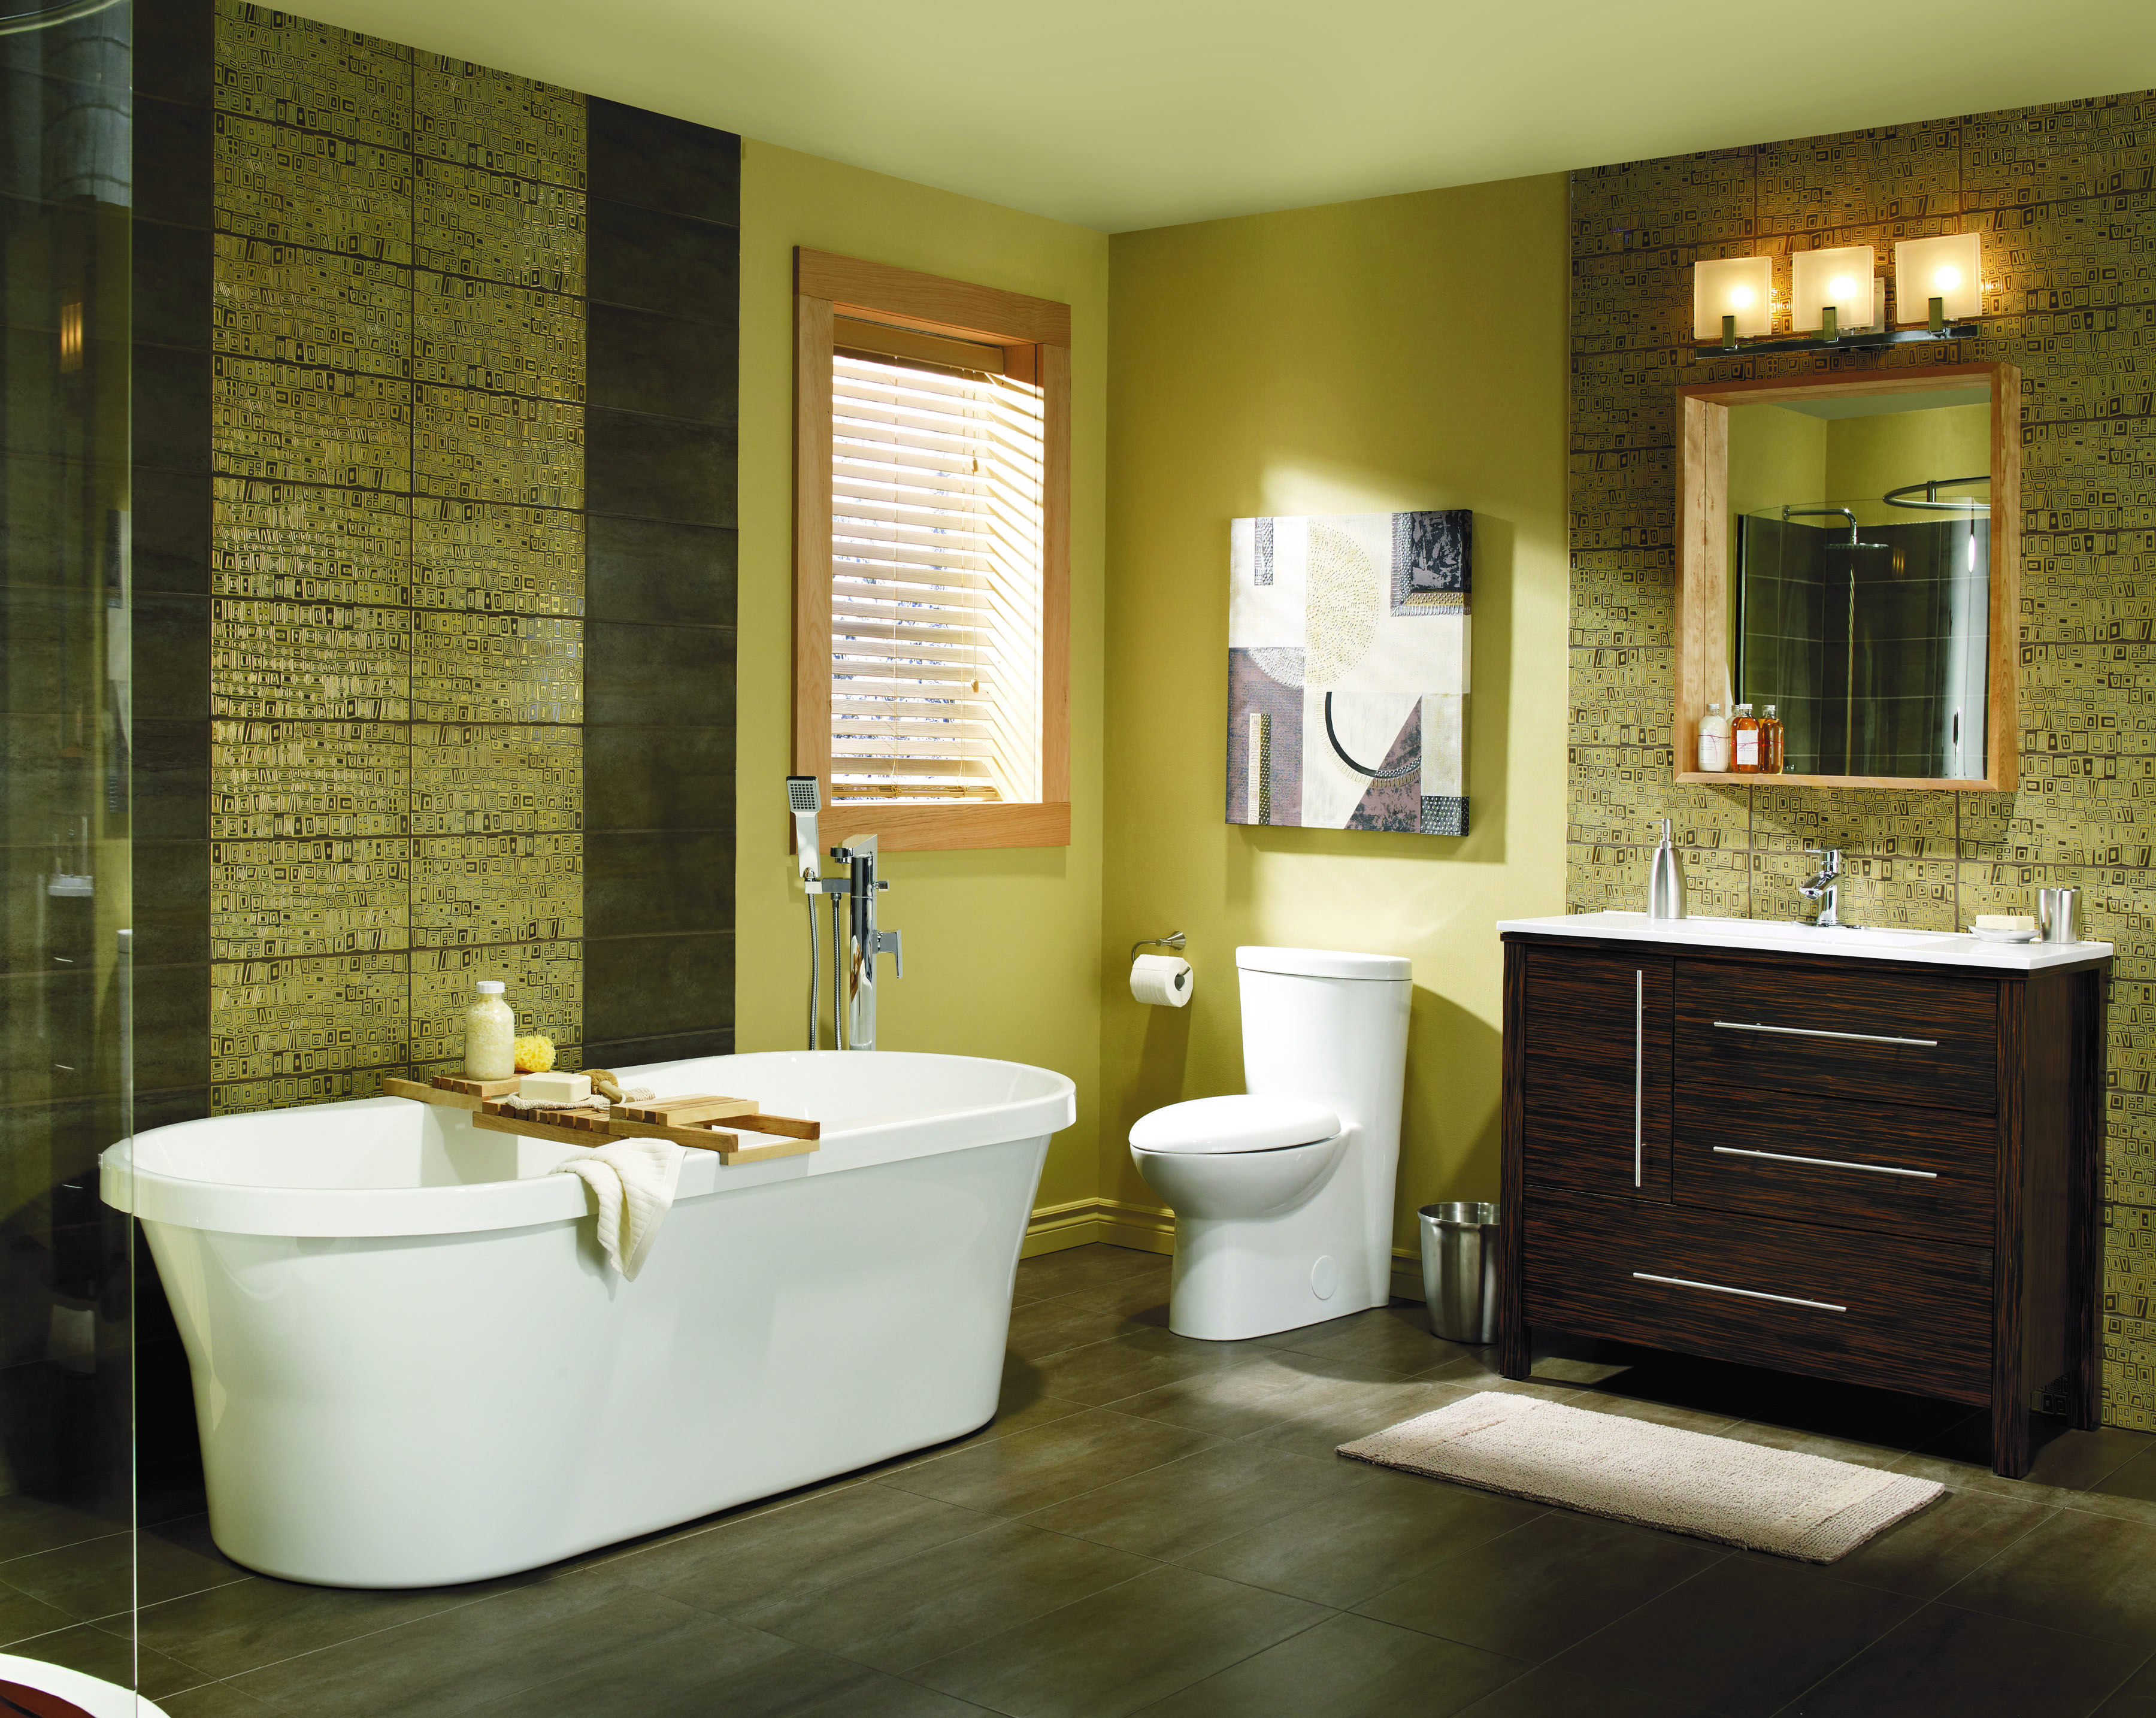 Bathroom design | Asian inspired decor, Bathroom designs and Asian ...